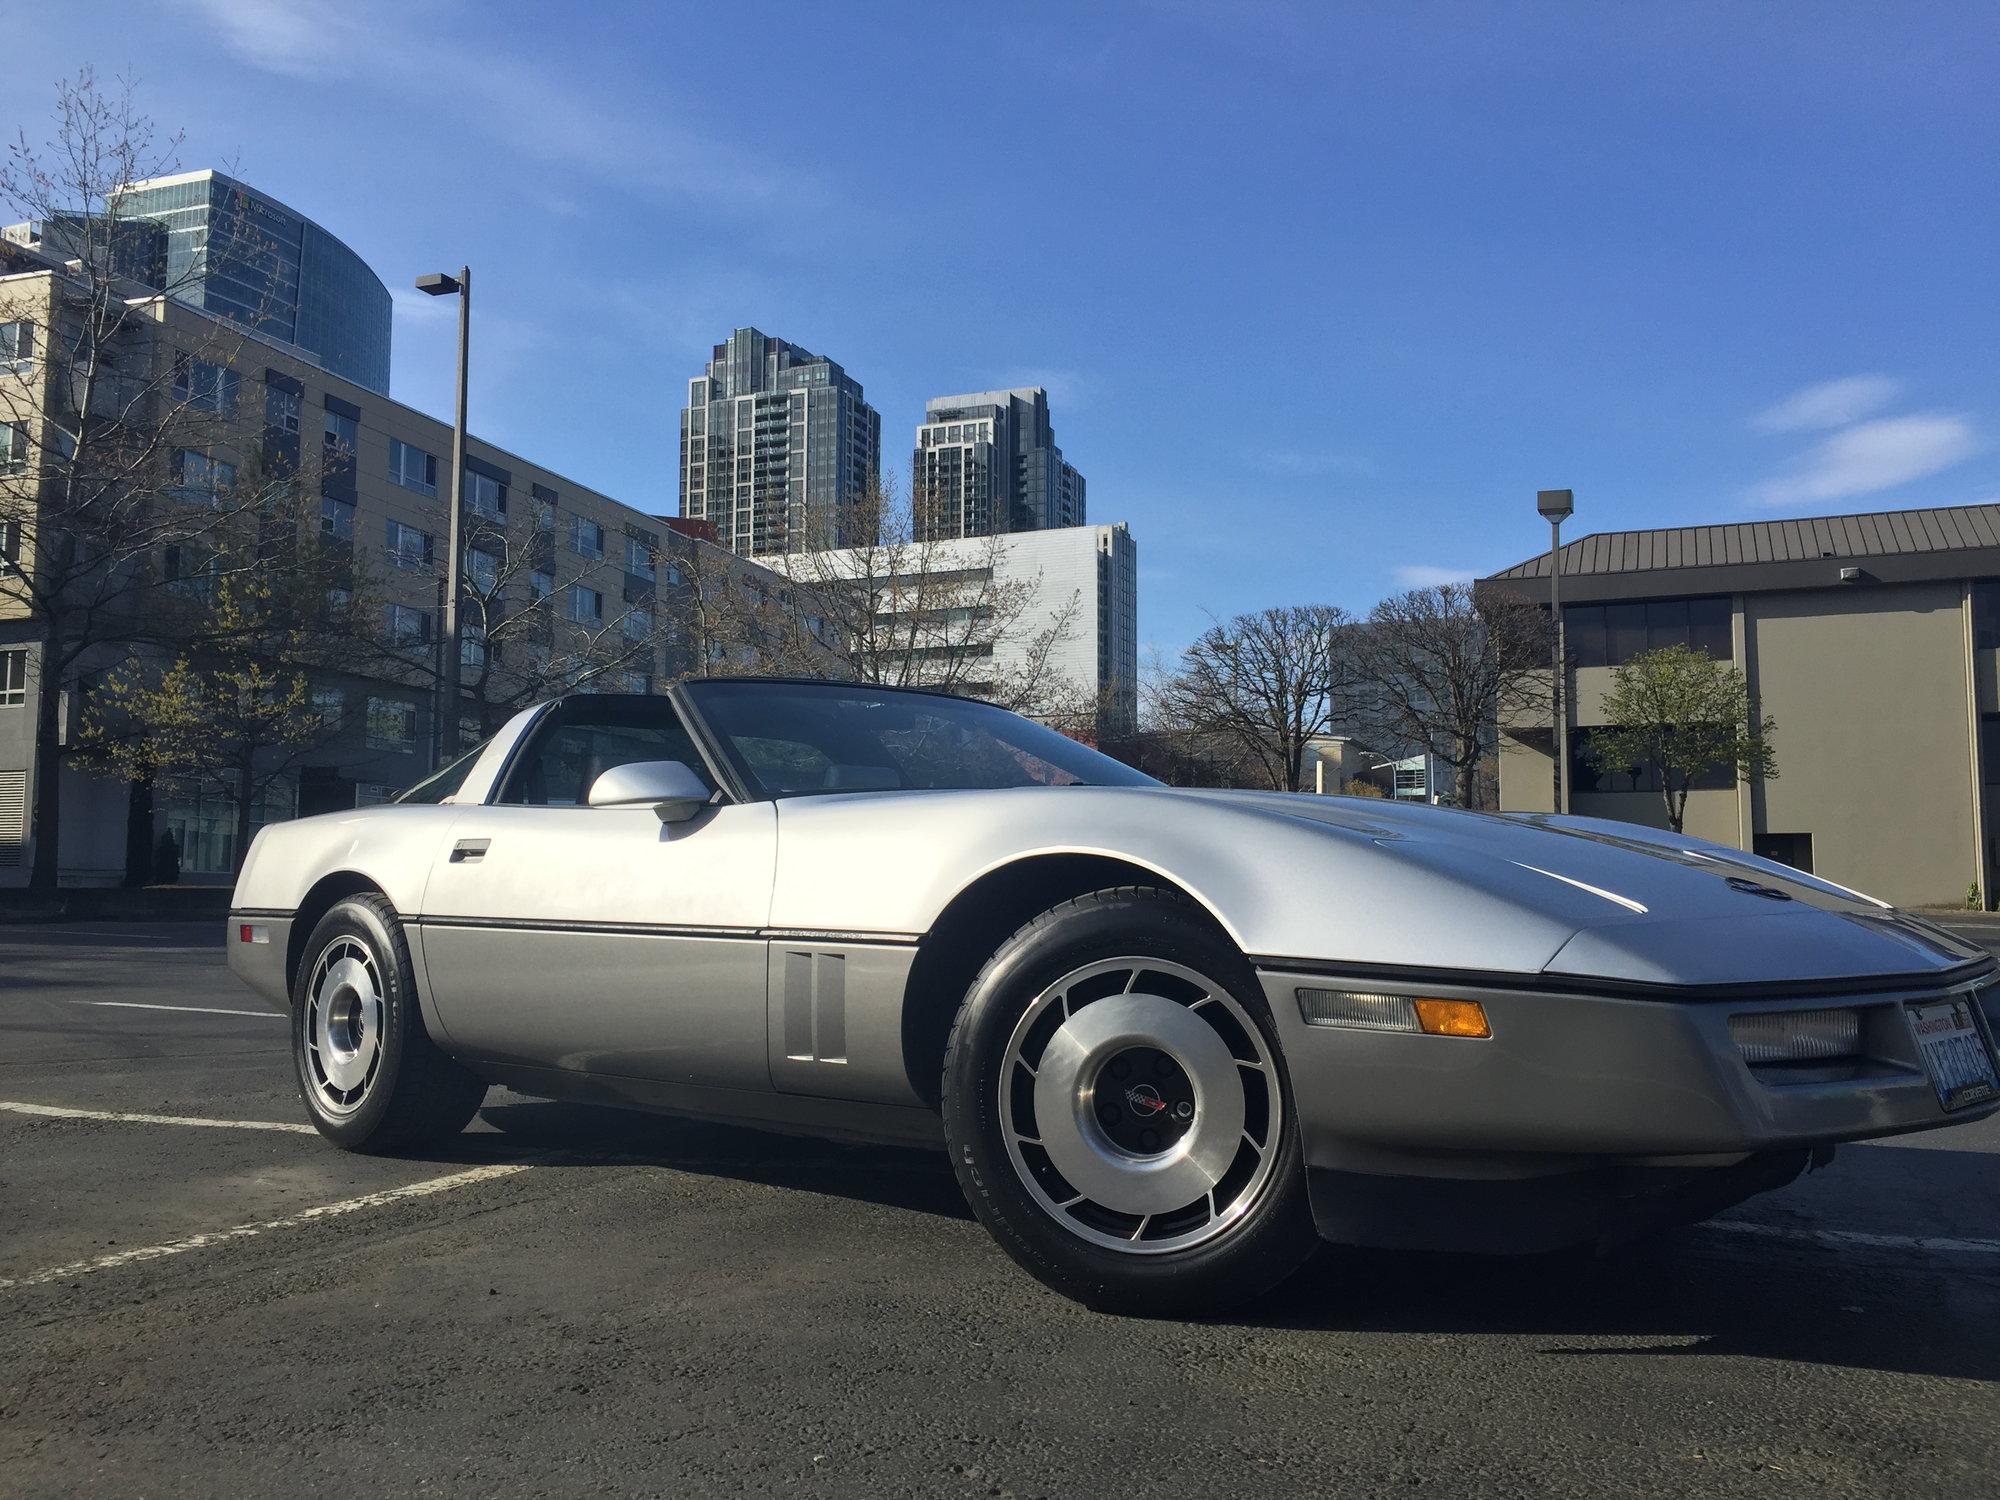 C4 Battery Drain Maybe Corvetteforum Chevrolet Corvette Forum Discussion